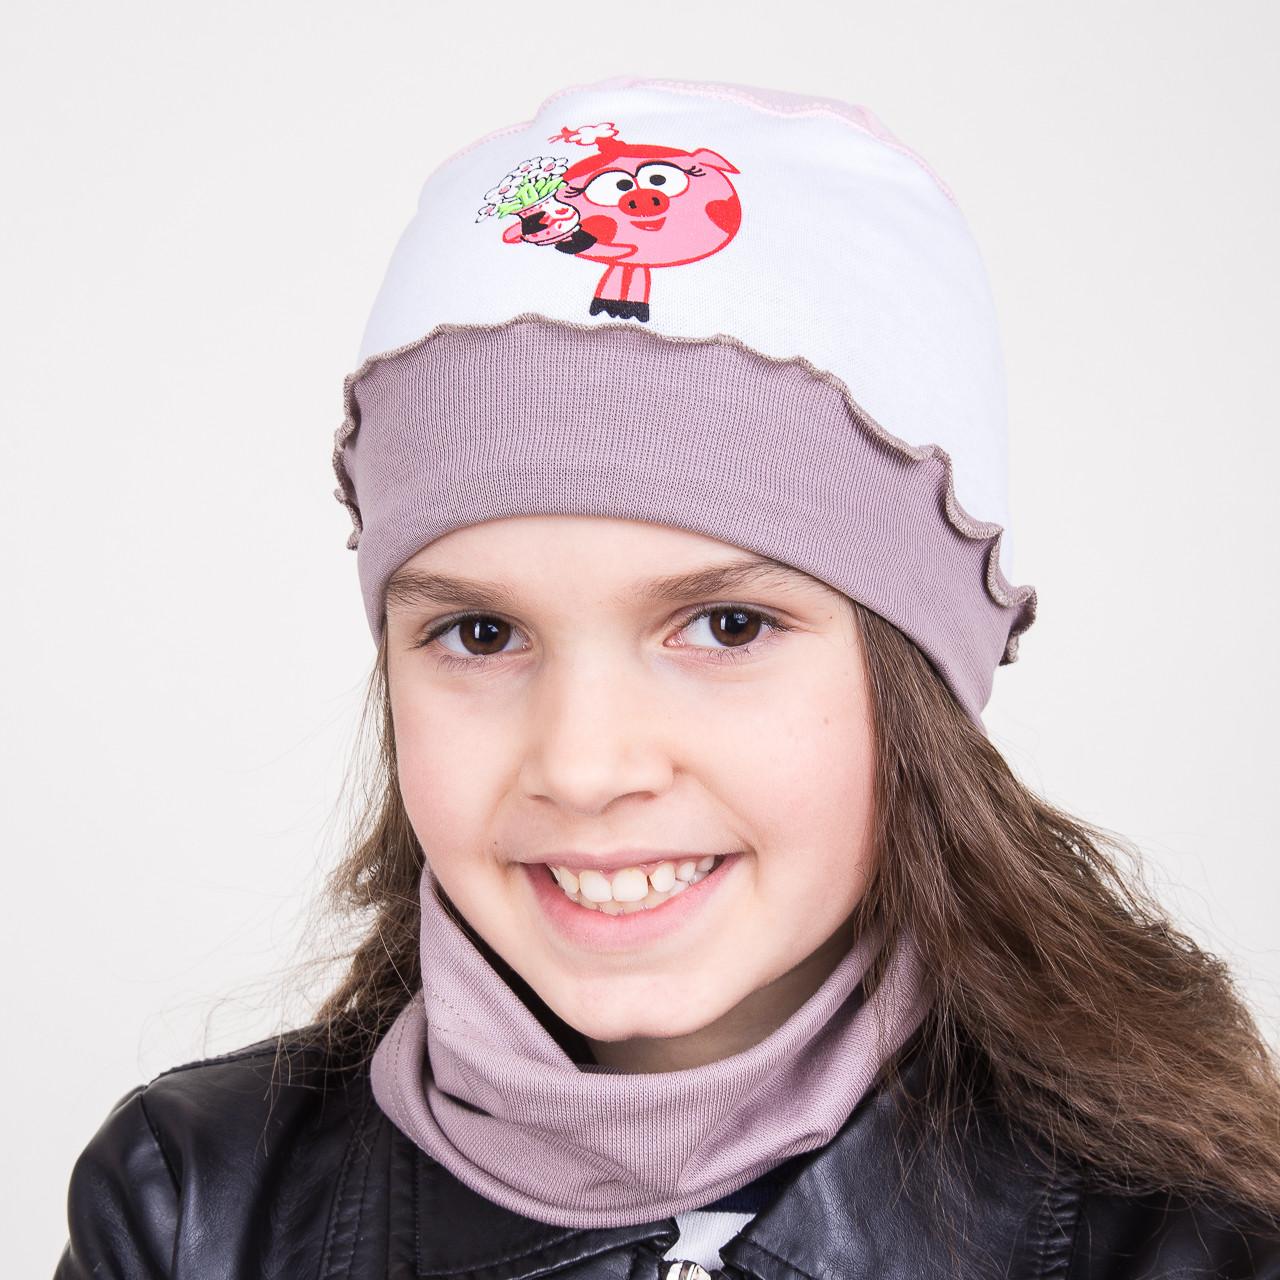 Комплект на весну для девочки - Артикул пеппа